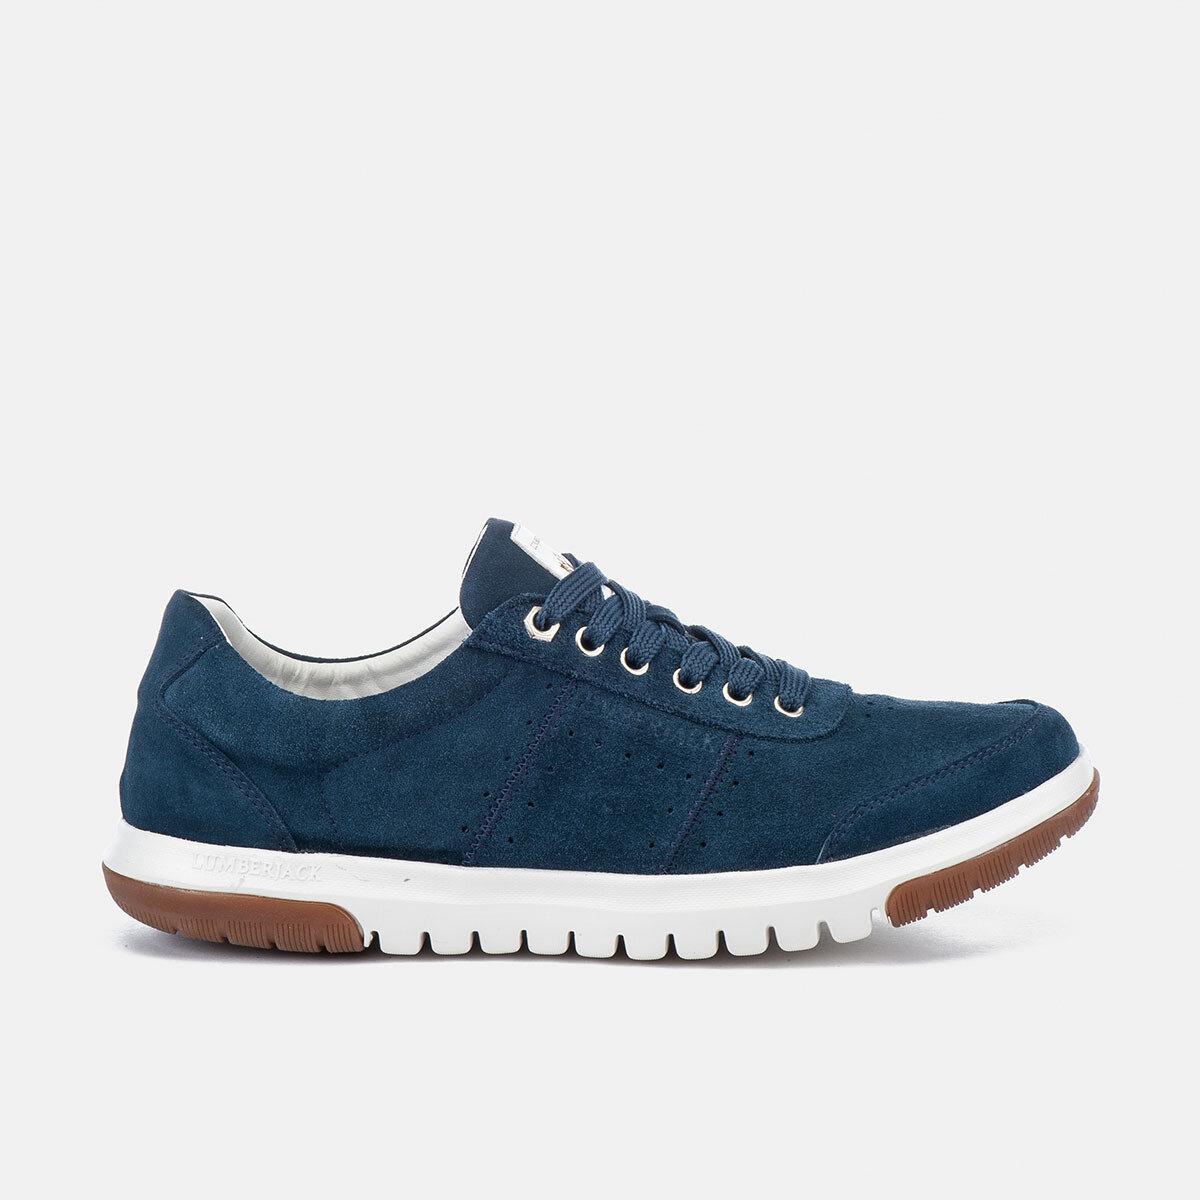 OTIS MOOD INDIGO BLUE Man Sneakers